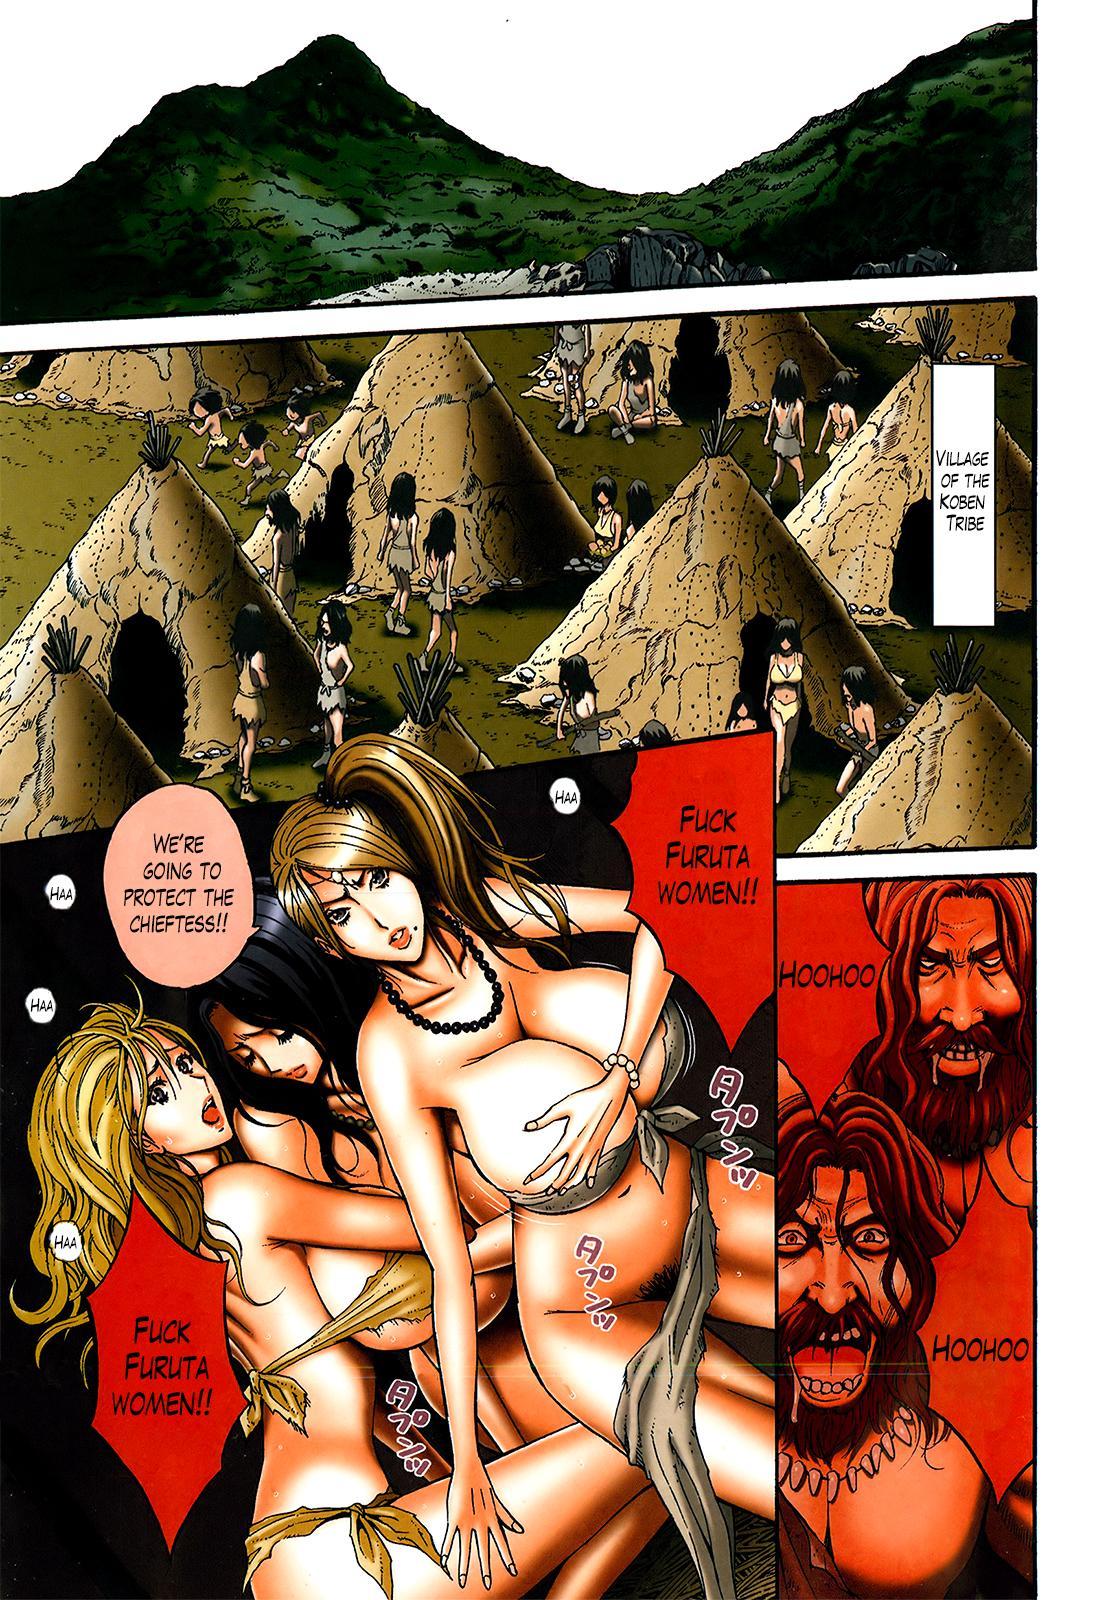 Kigenzen 10000 Nen no Ota   The Otaku in 10,000 B.C. Ch. 1-22 175